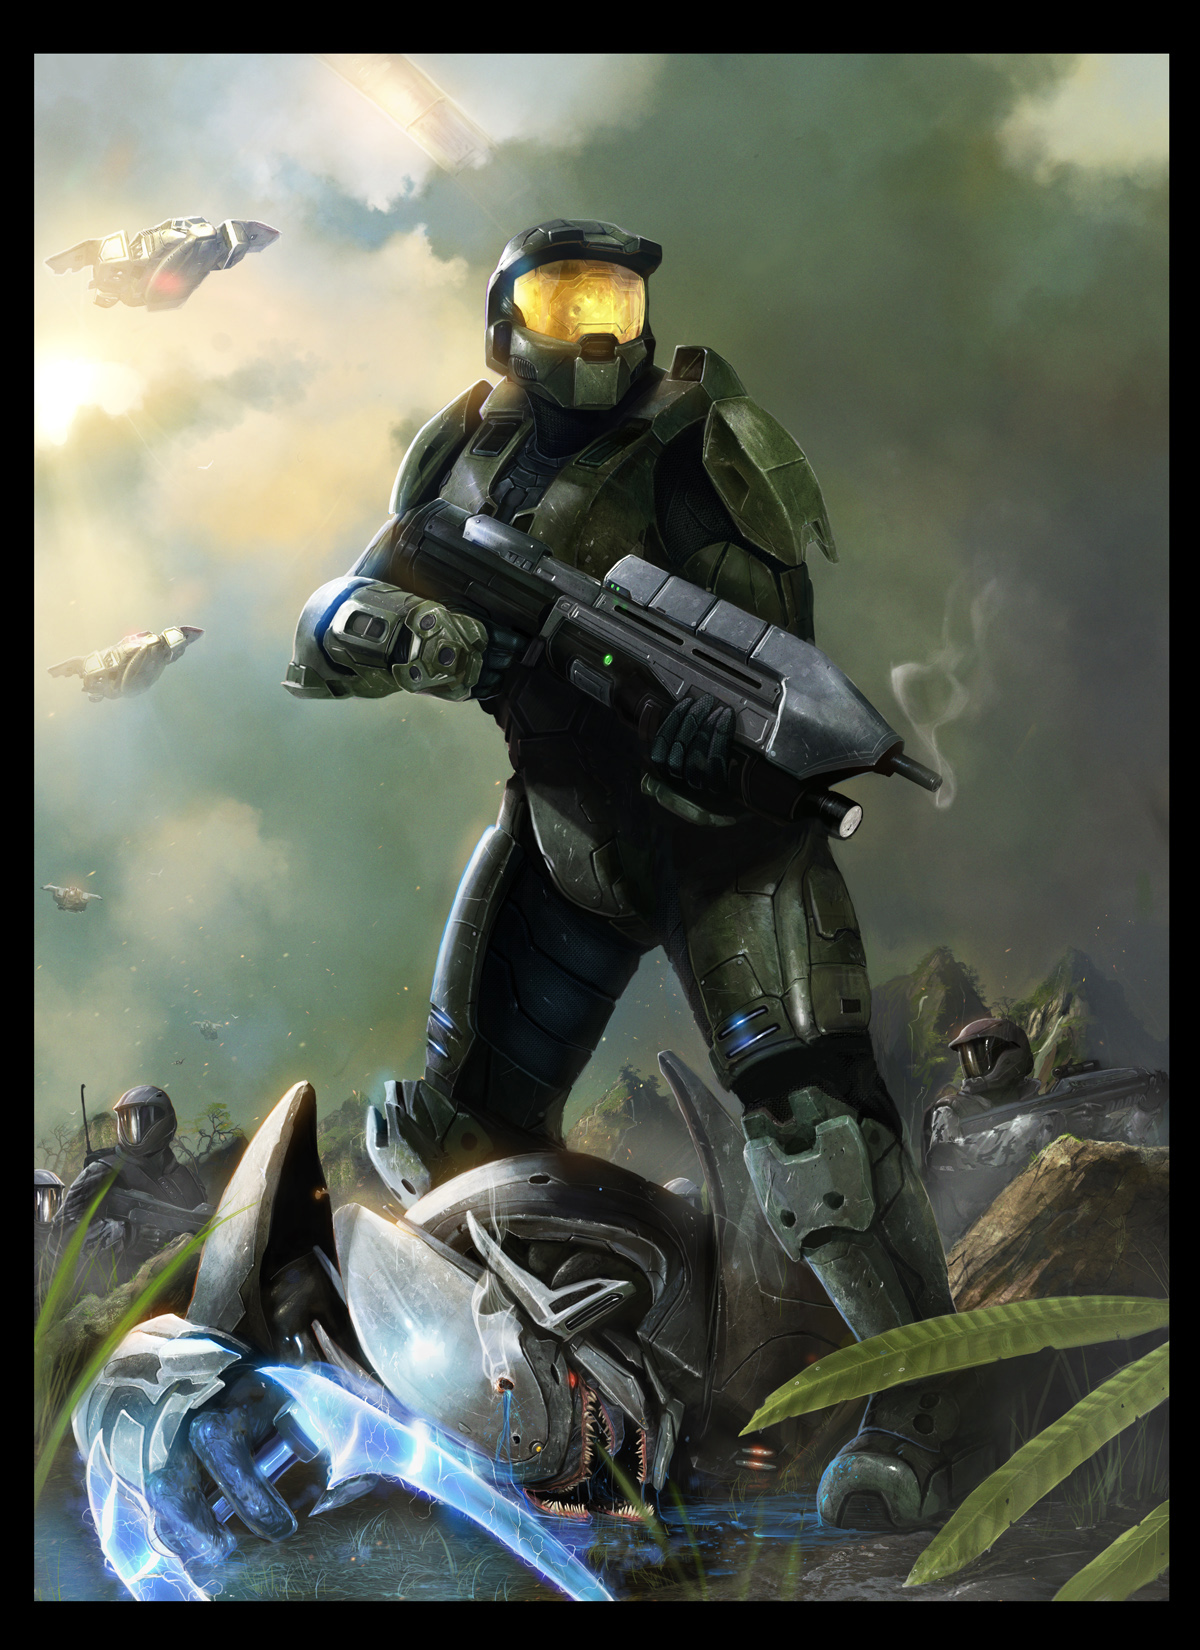 http://fc15.deviantart.com/fs16/f/2007/196/9/3/Halo__Master_Chief___by_adonihs.jpg